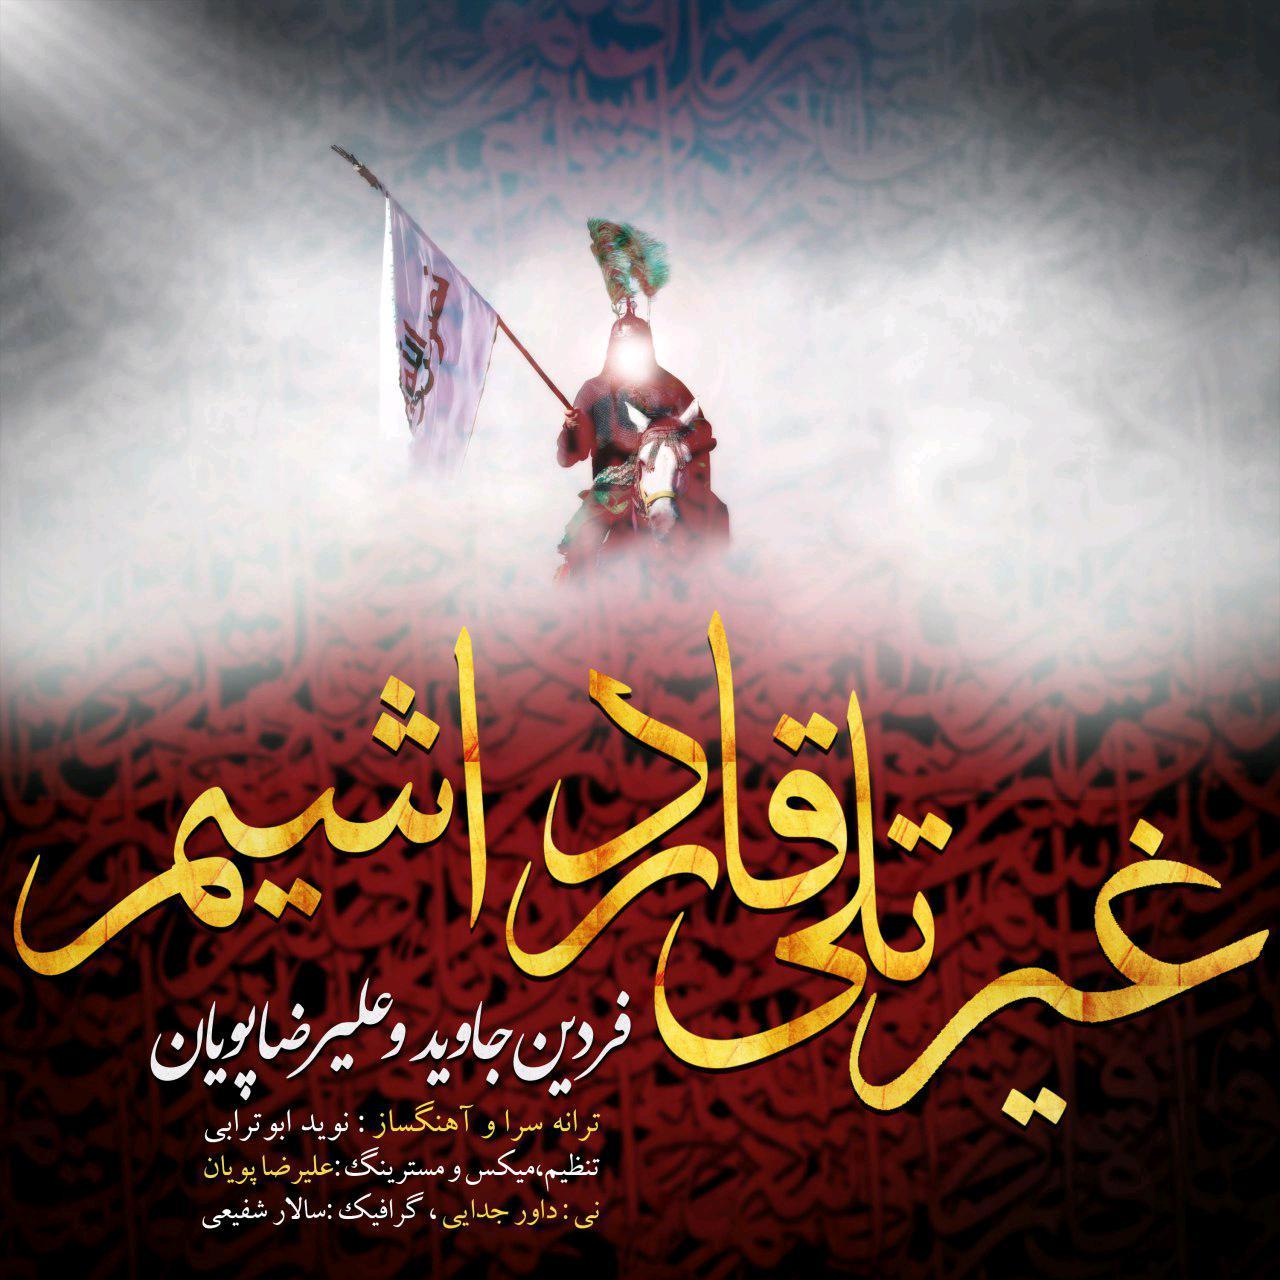 http://s9.picofile.com/file/8307805884/02Fardin_Javid_Ft_Alireza_Pouyan_Gheyratli_Ghardashim.jpg